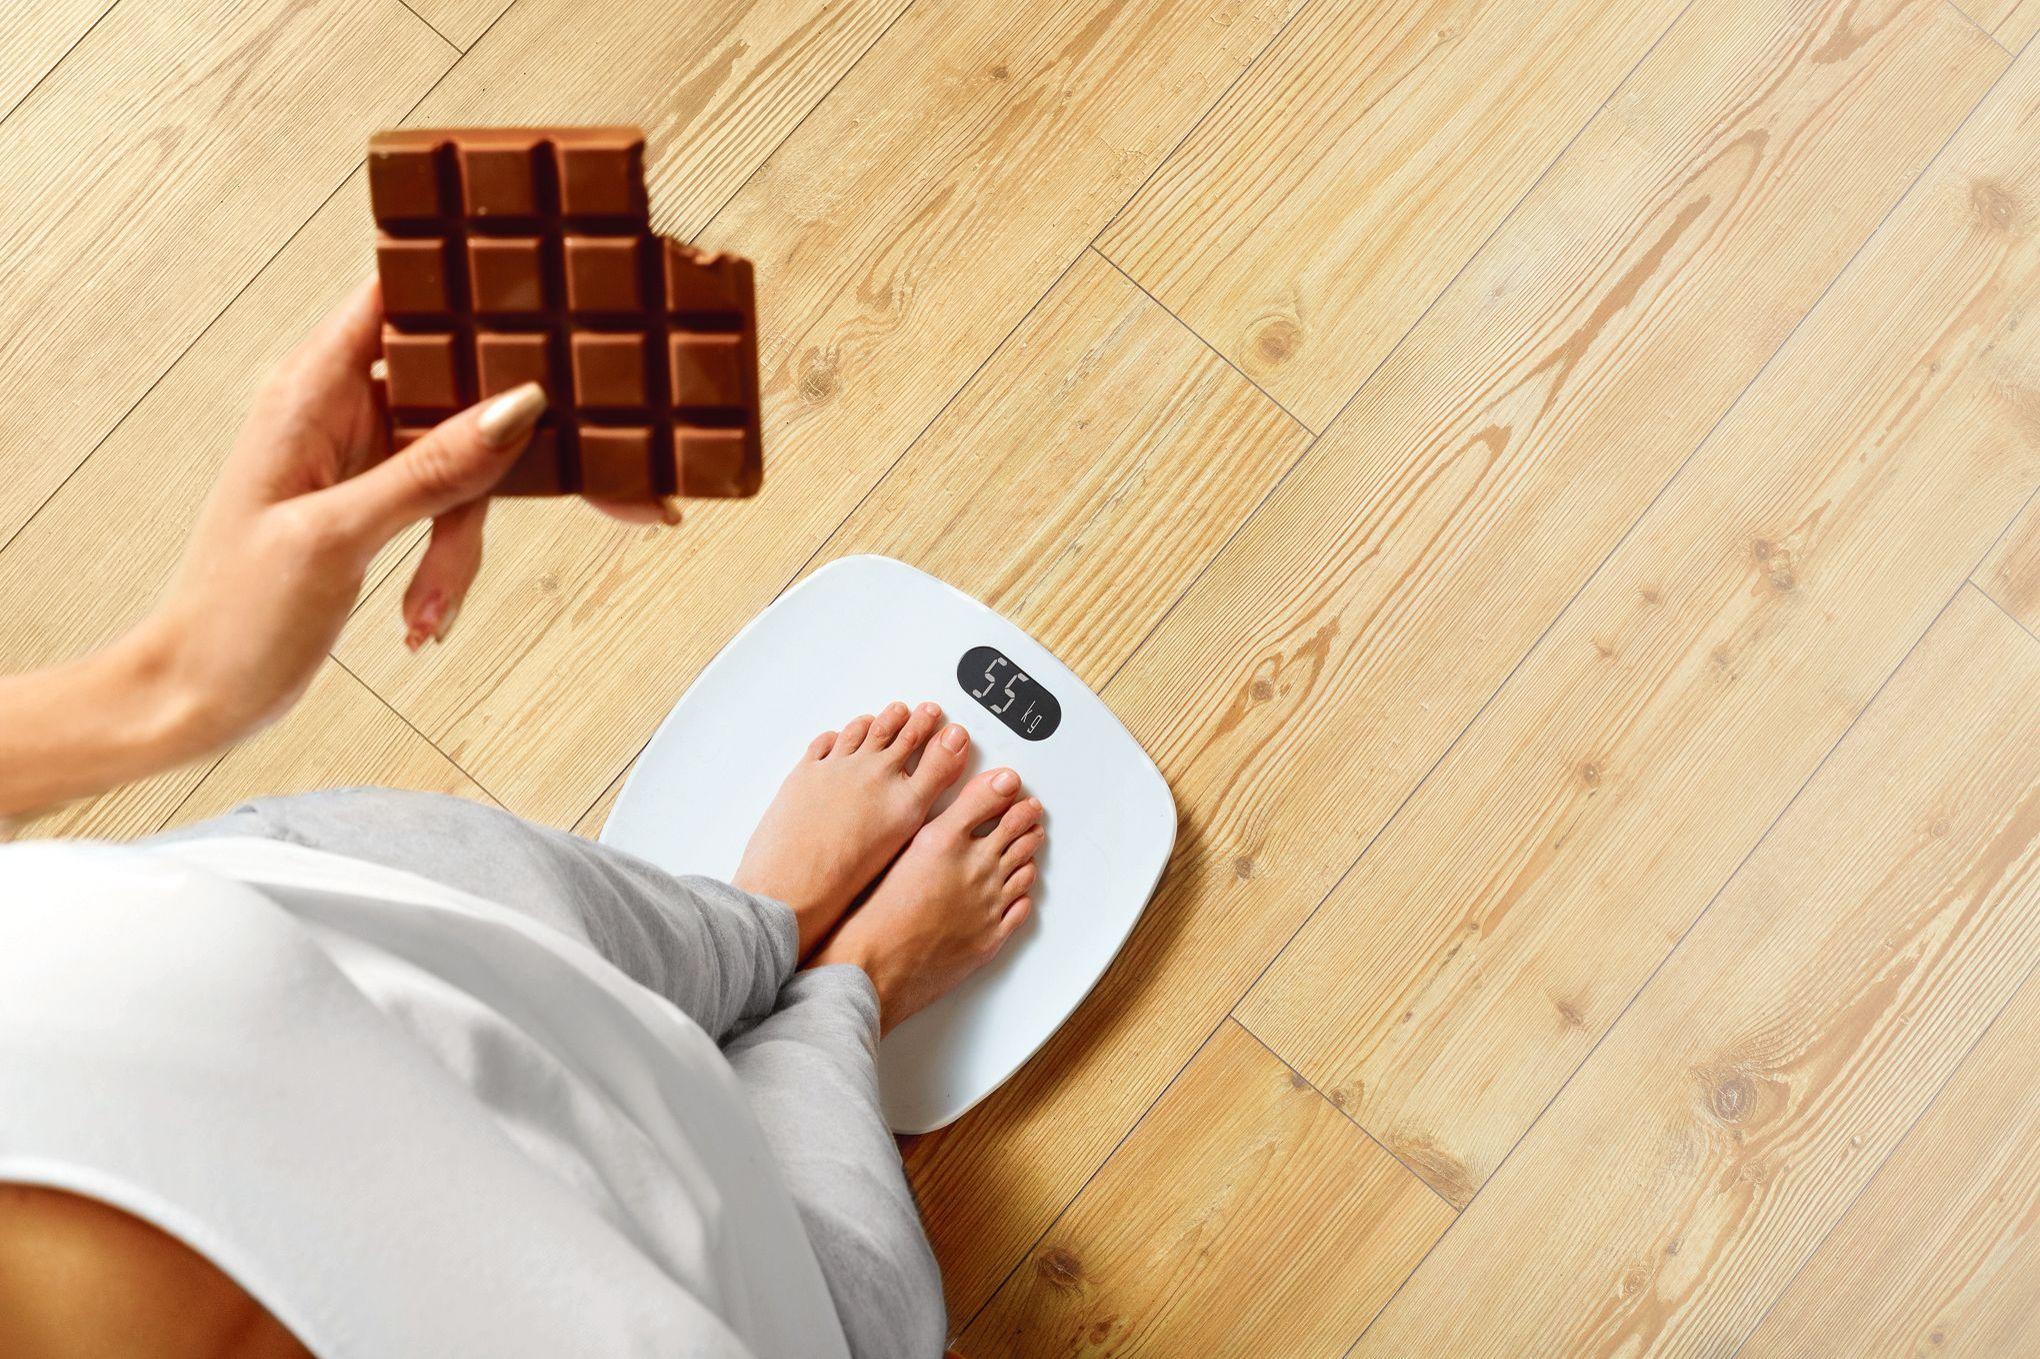 jai besoin dun sort de perte de poids